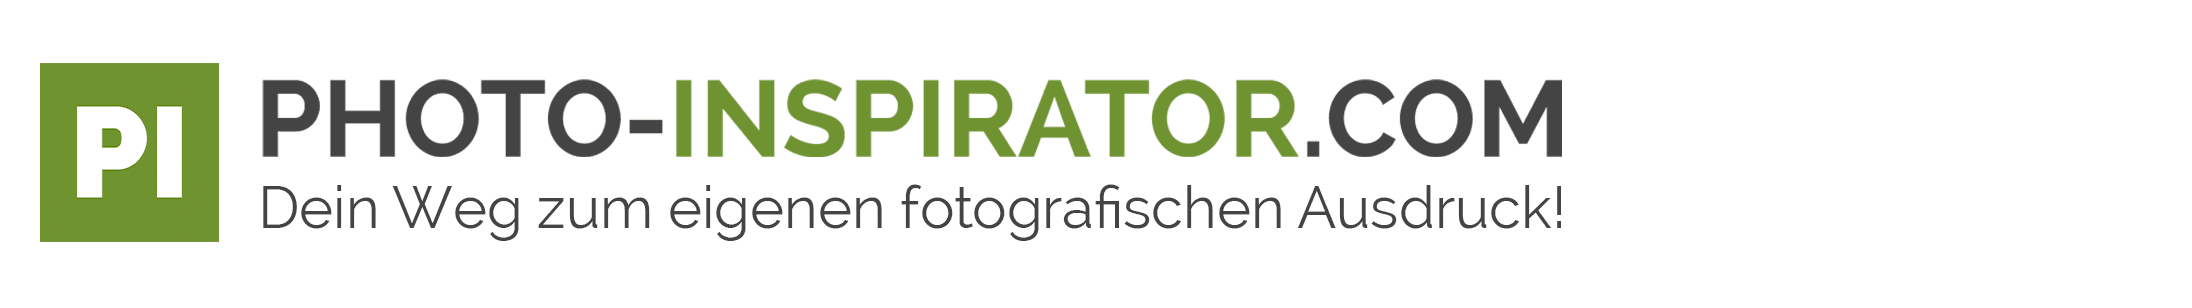 PhotoInspirator